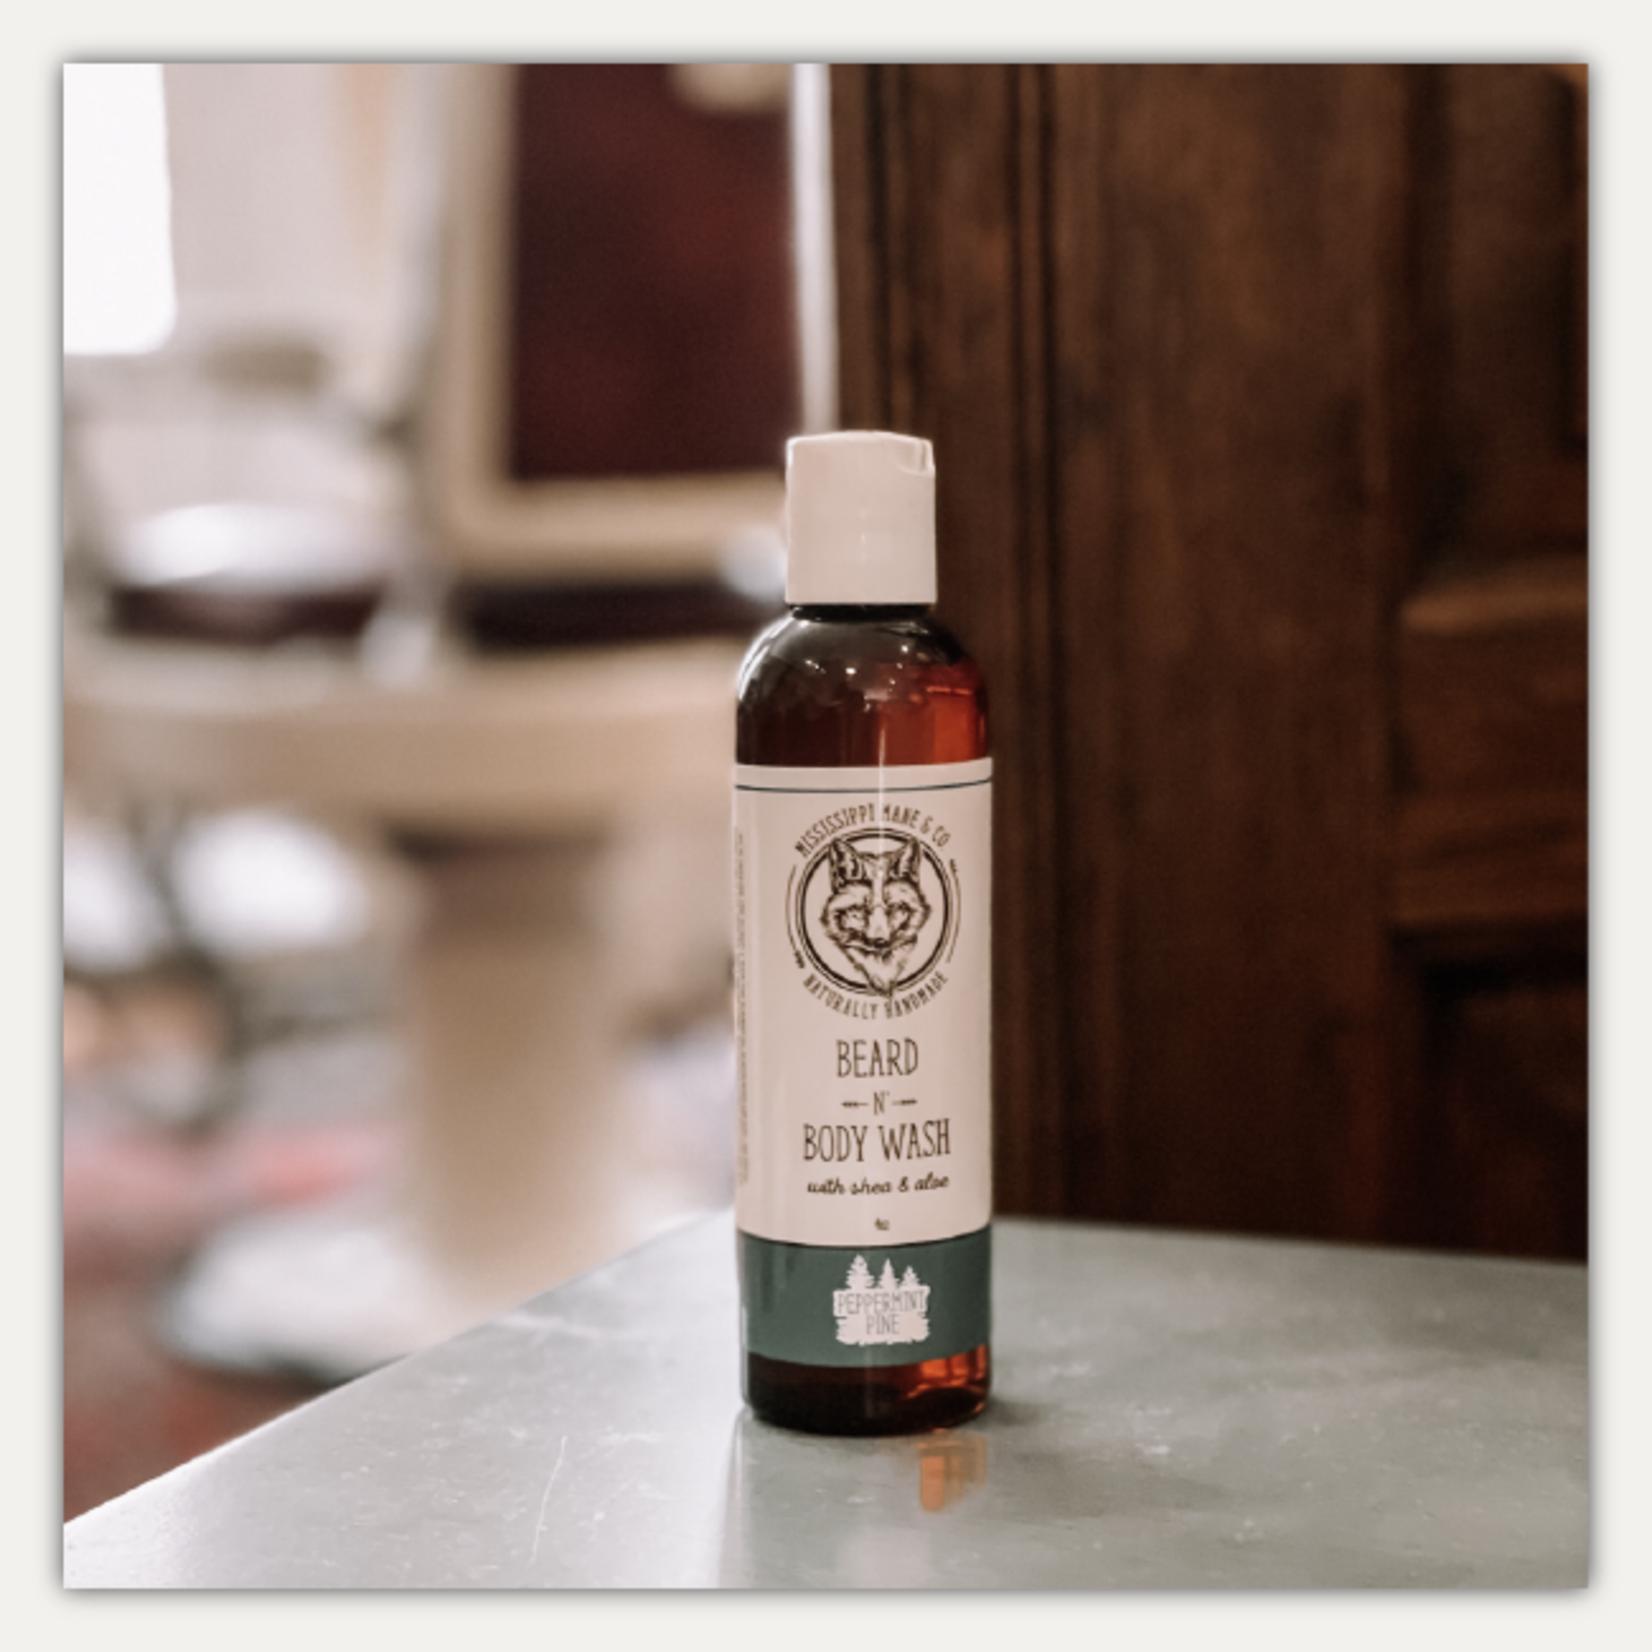 Mississippi Mane & Co. Mississippi Mane & Co. Beard & Body Wash